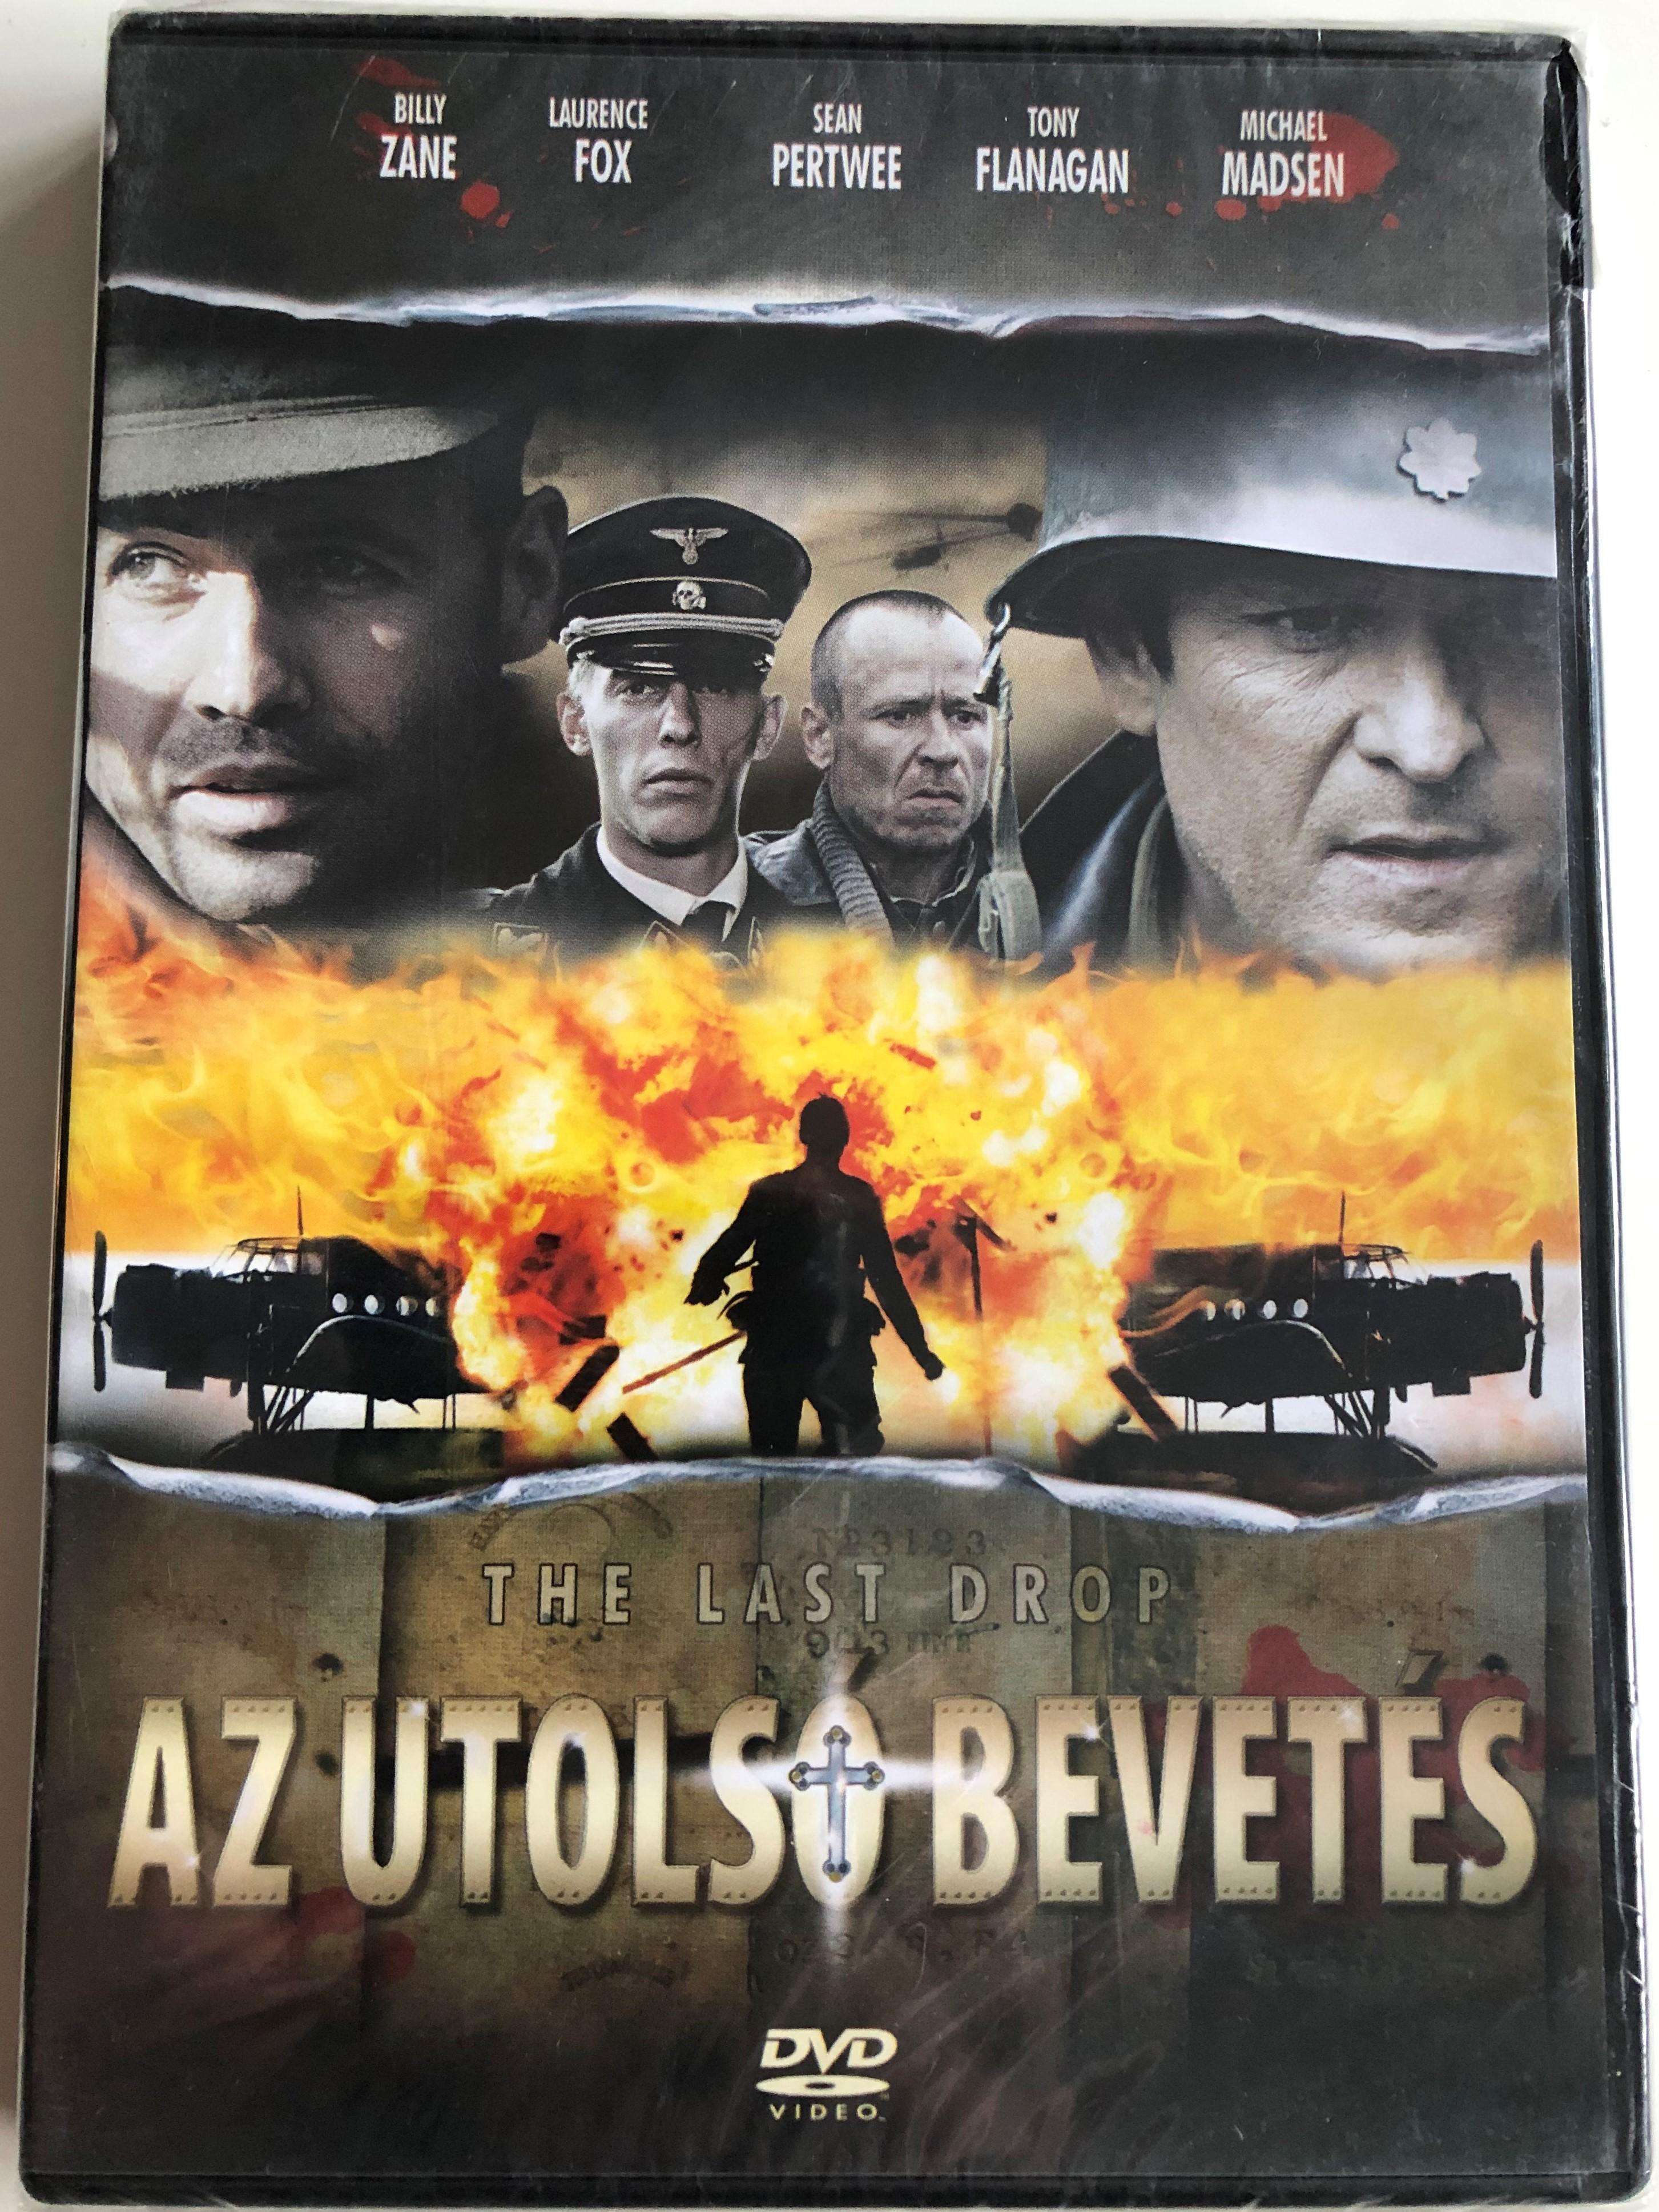 the-last-drop-dvd-az-utols-bevet-s-directed-by-colin-teague-1.jpg